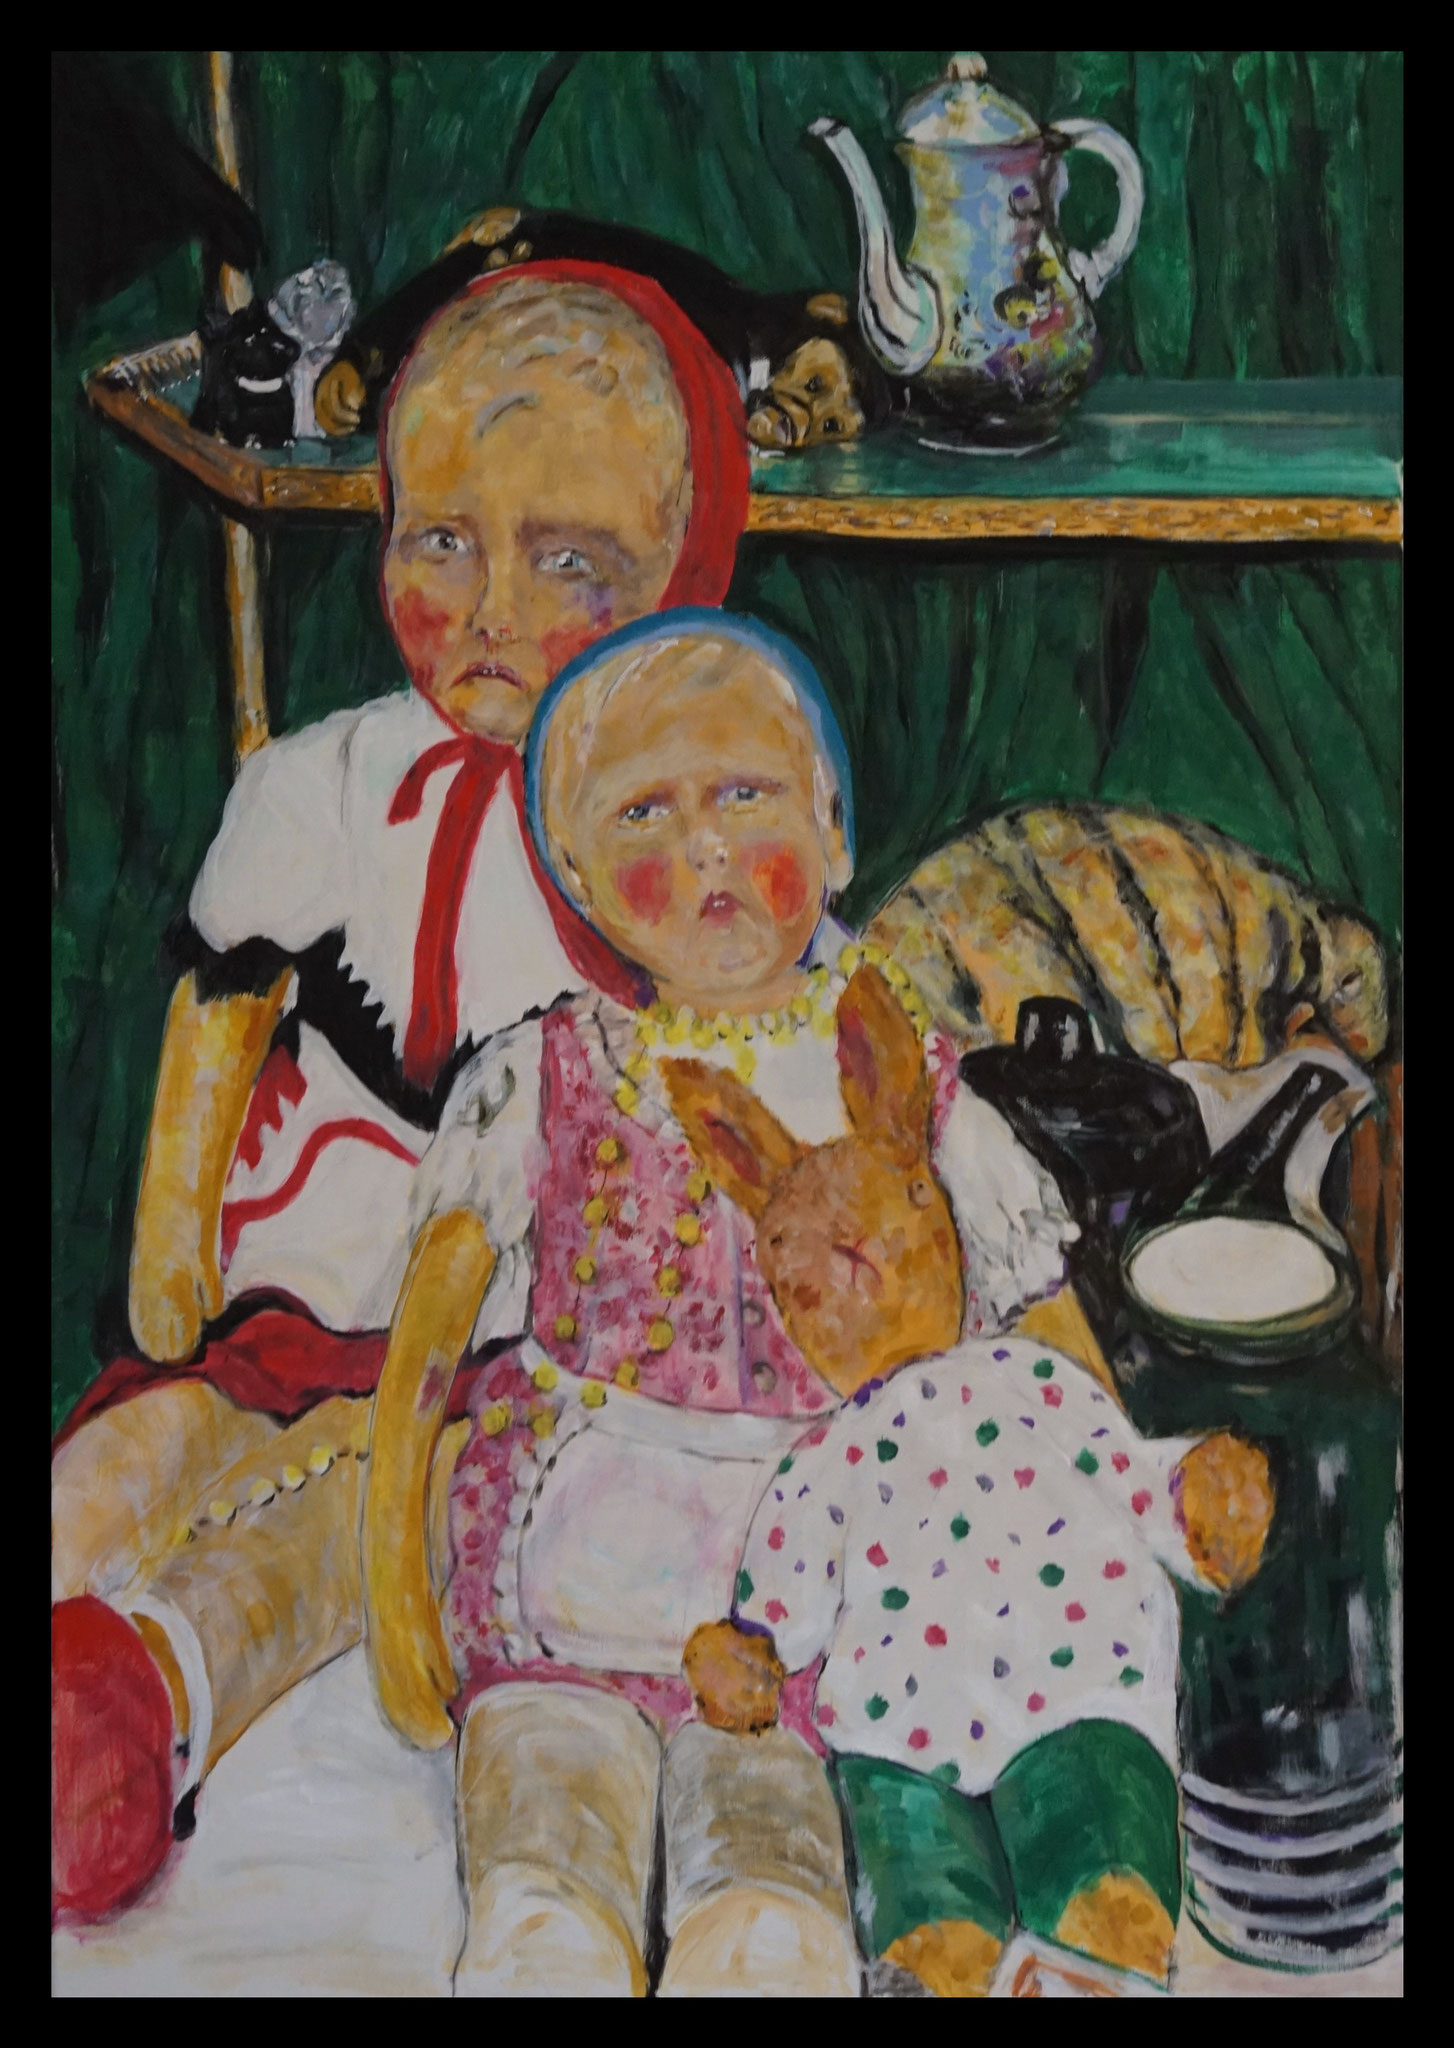 Rotbäckchen, Acryl, 2020, 70x100 cm